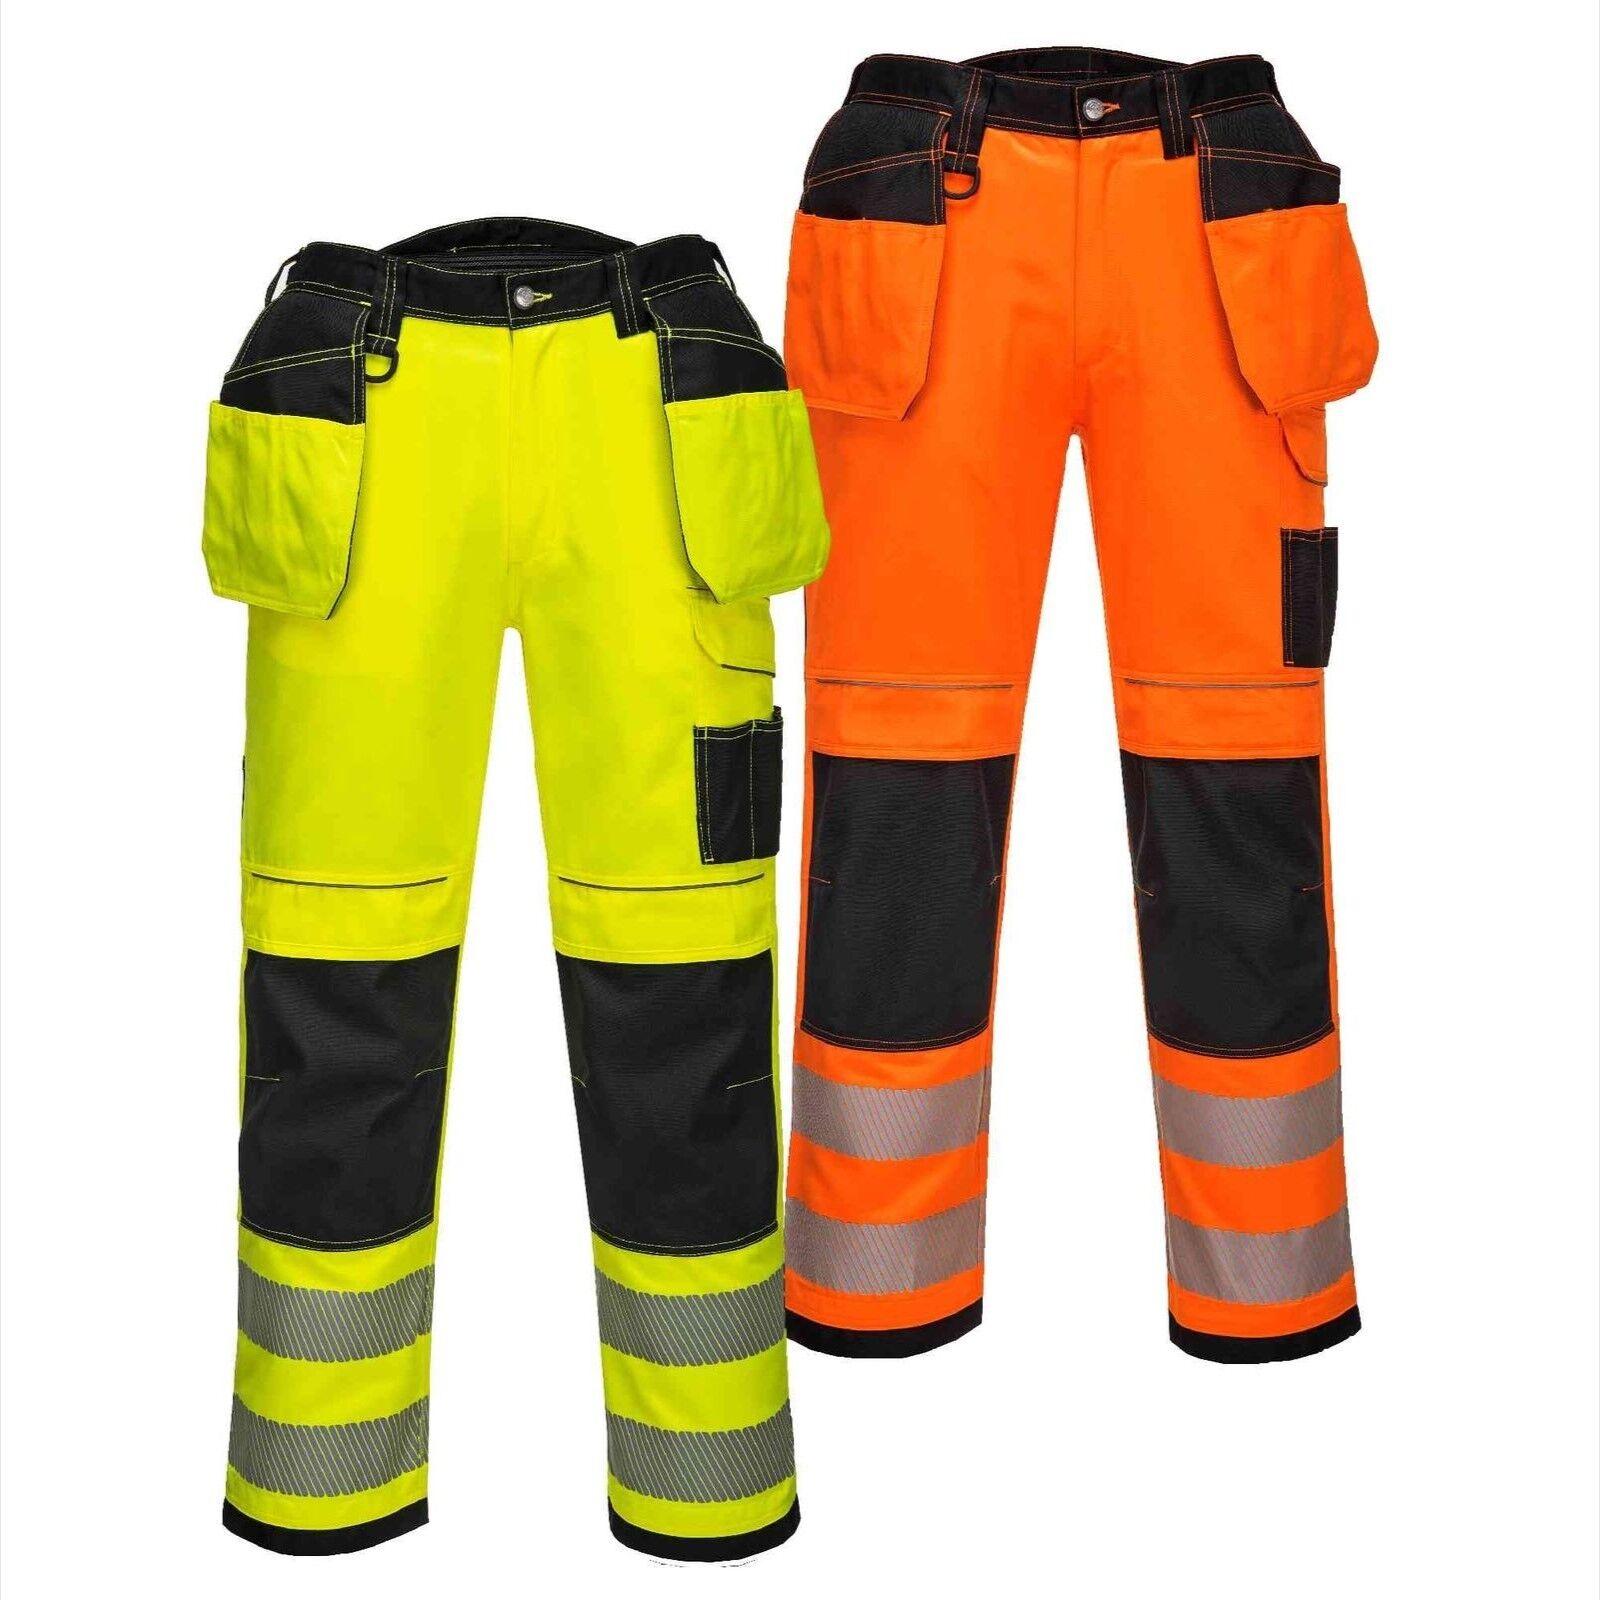 Portwest Hi Vis Two Tone Hi Vis Work Safety Trousers Knee Pad Pockets PW3 T501